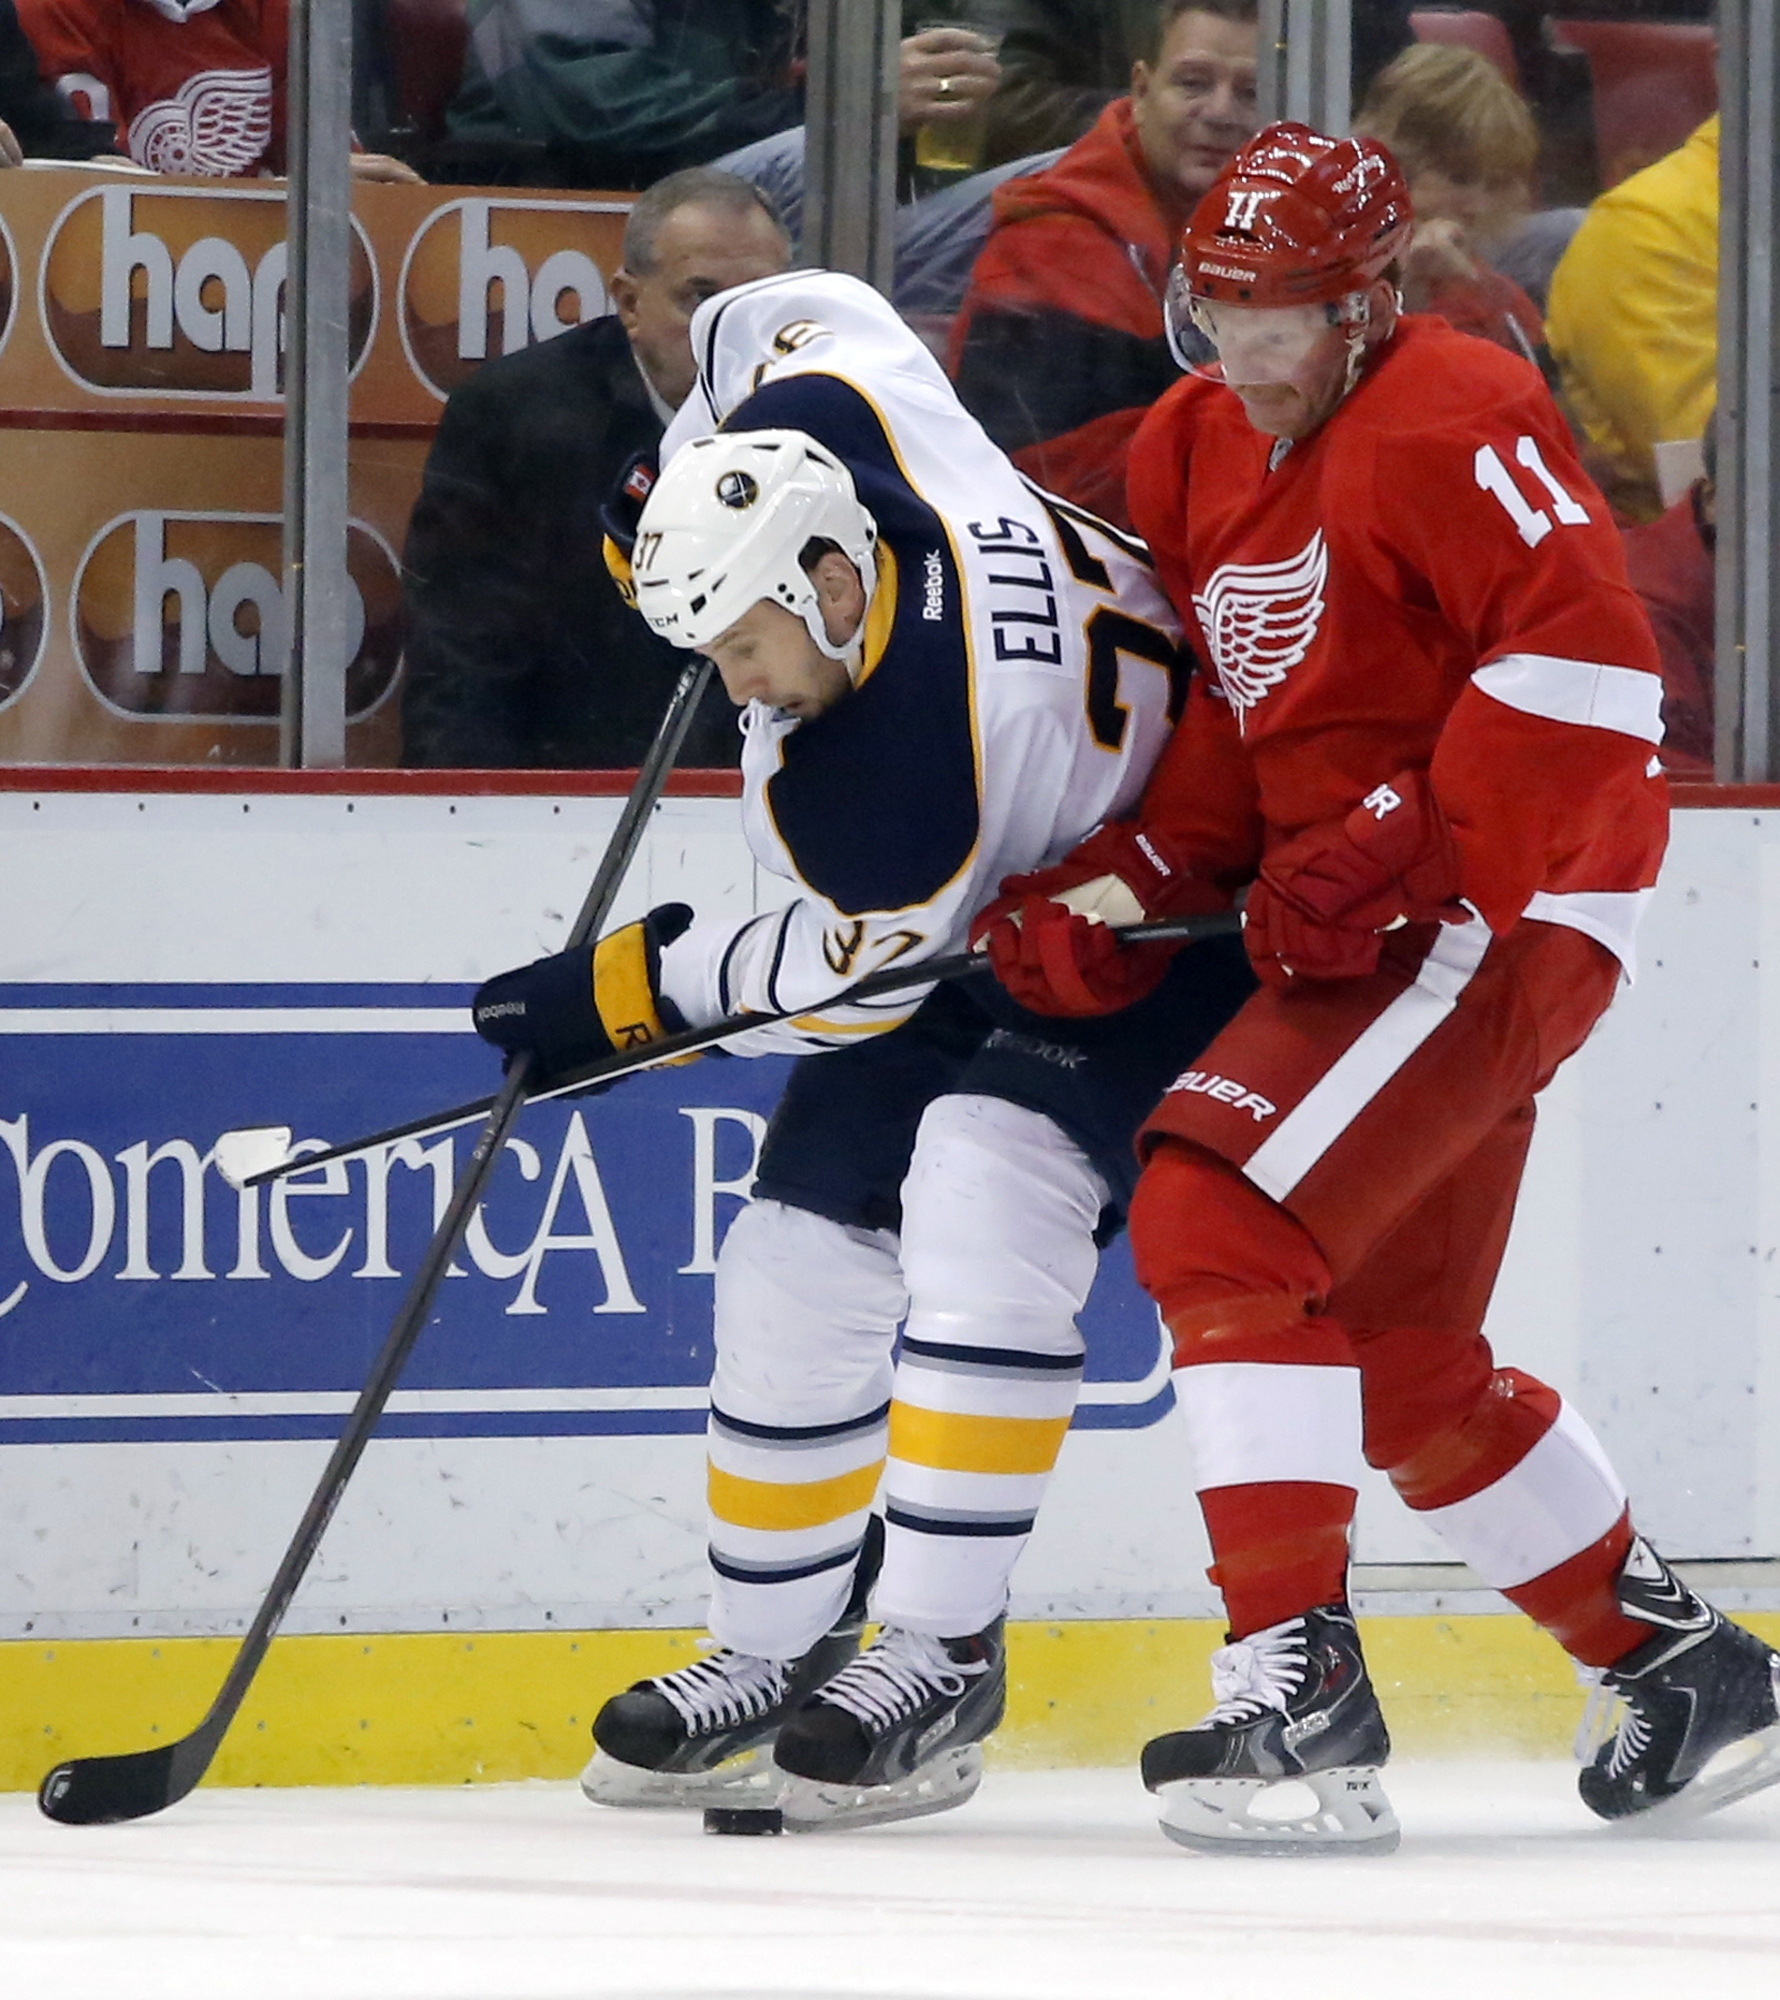 Buffalo's Matt Ellis battles Detroit's Daniel Alfredsson for a loose puck during the Red Wings' 3-2 win.